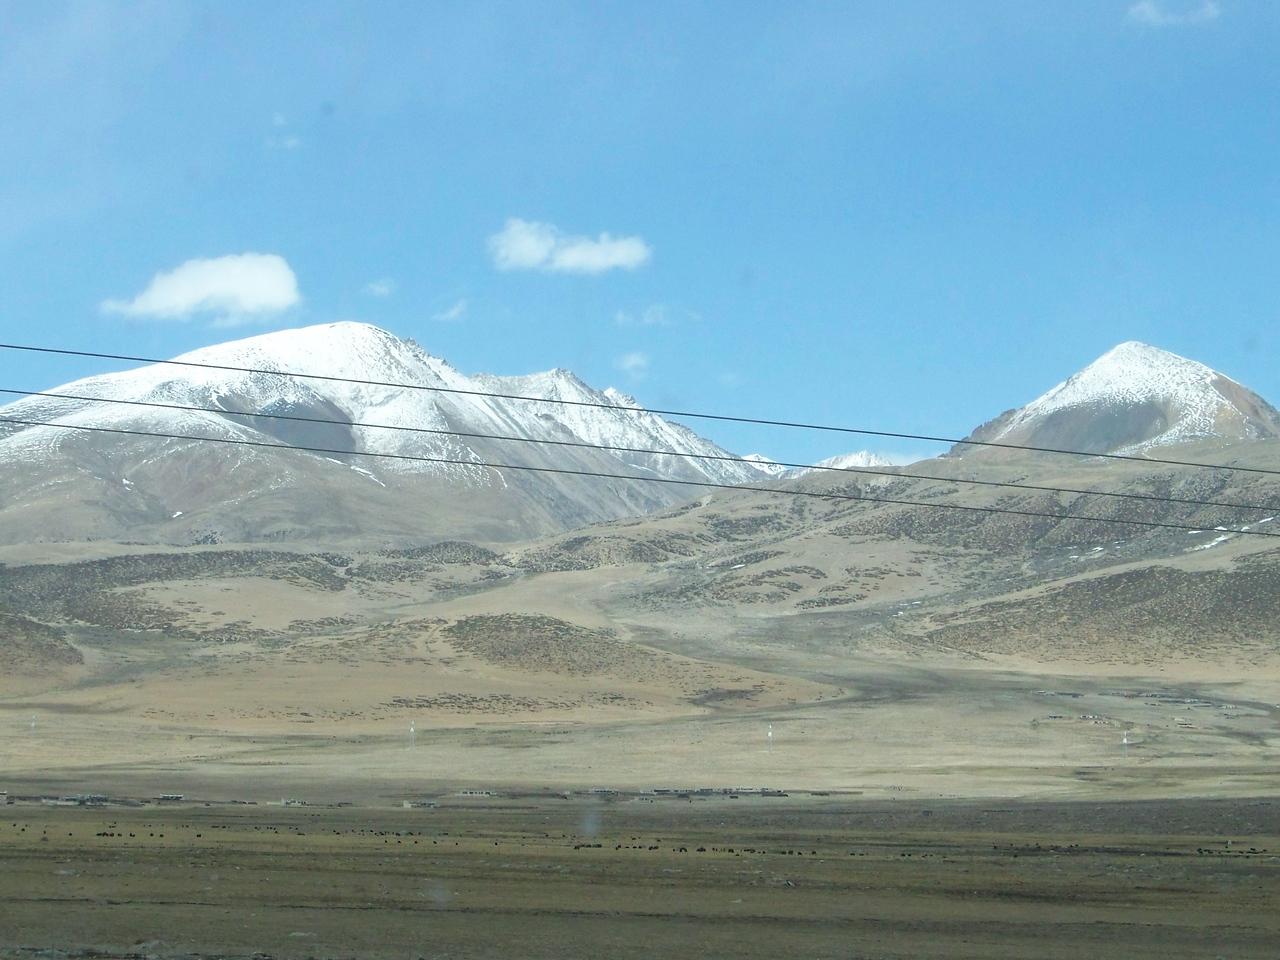 0118 - Scenery on Train Trip Between Beijing and Lhasa.JPG